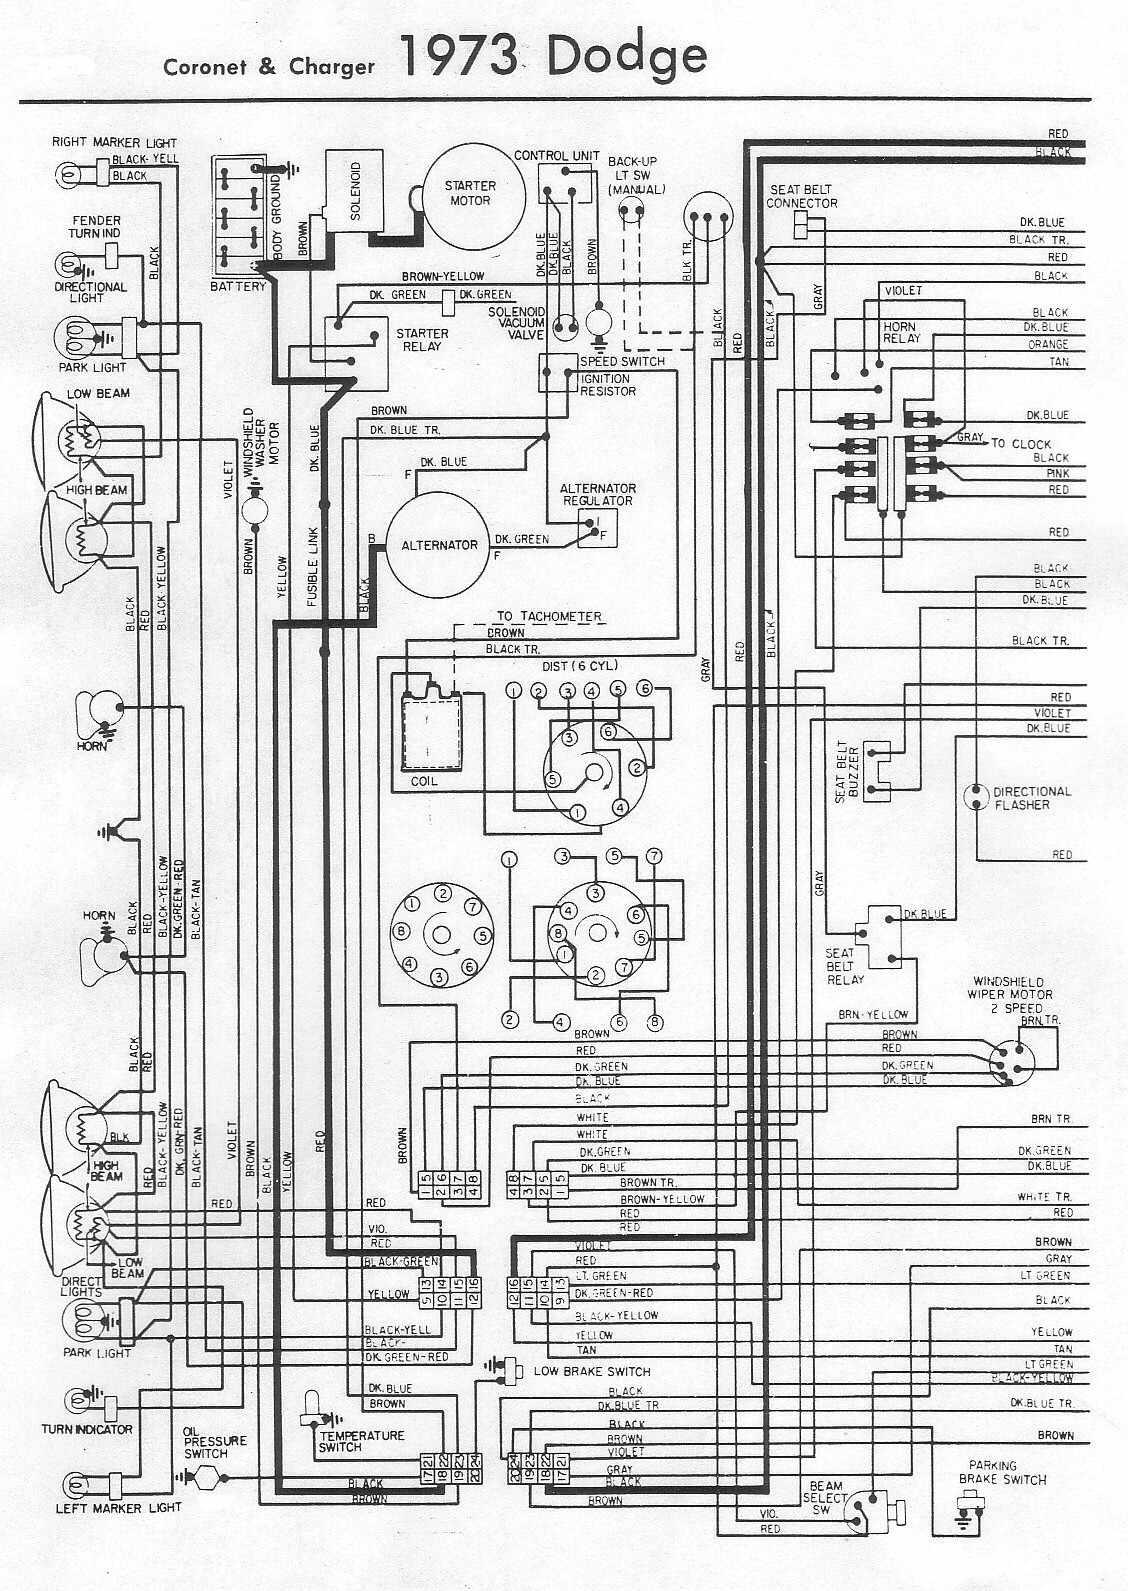 hight resolution of citroen saxo fuse box layout wiring librarycitroen saxo fuse box diagram wiring diagrams source blazer